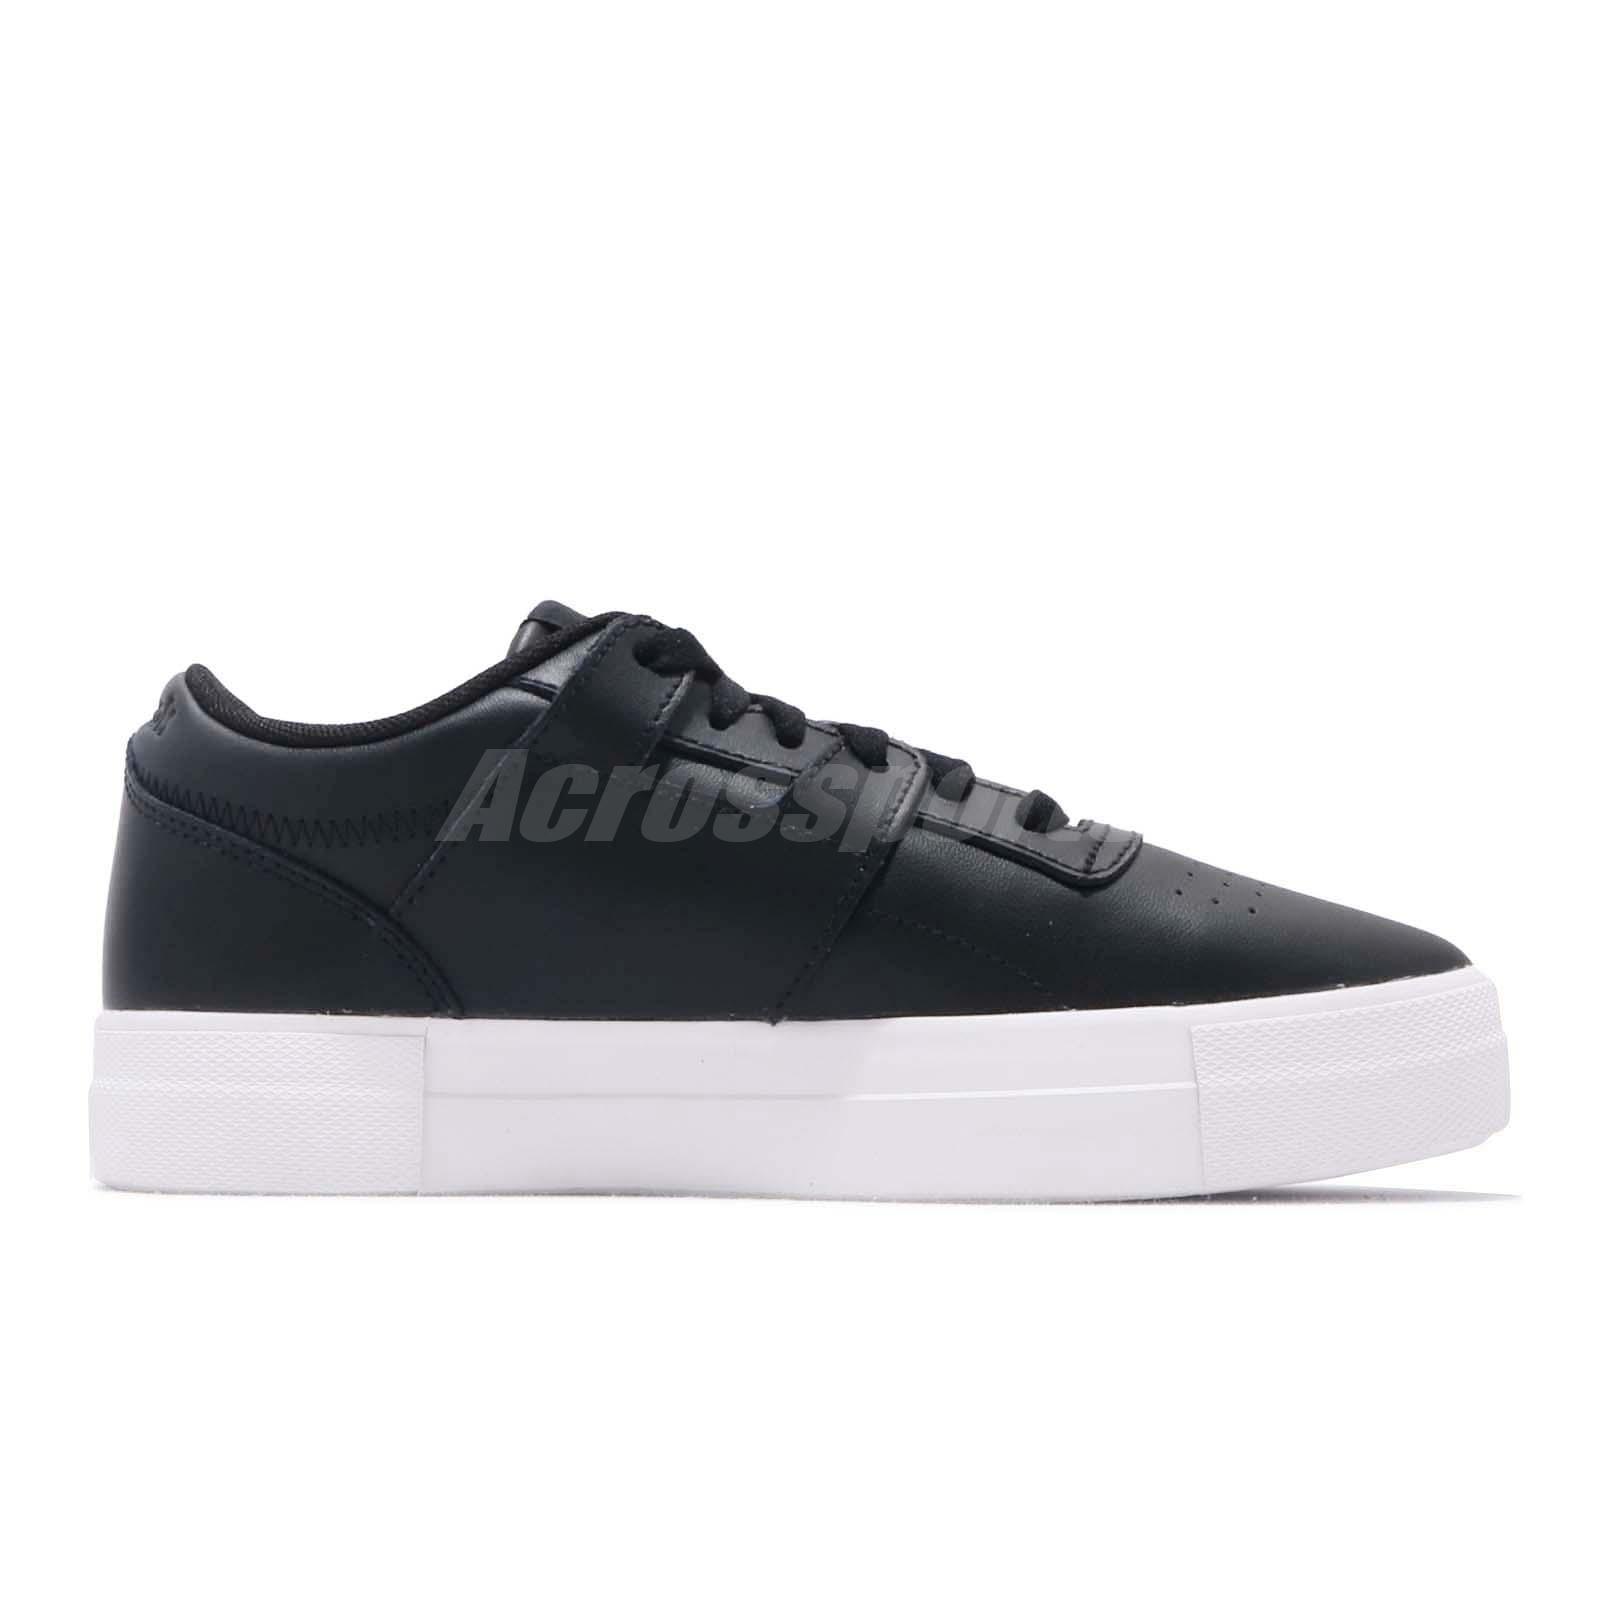 Details about Reebok Workout LO FVS Basic Black White Women Classic Casual Shoe Sneaker CN6891